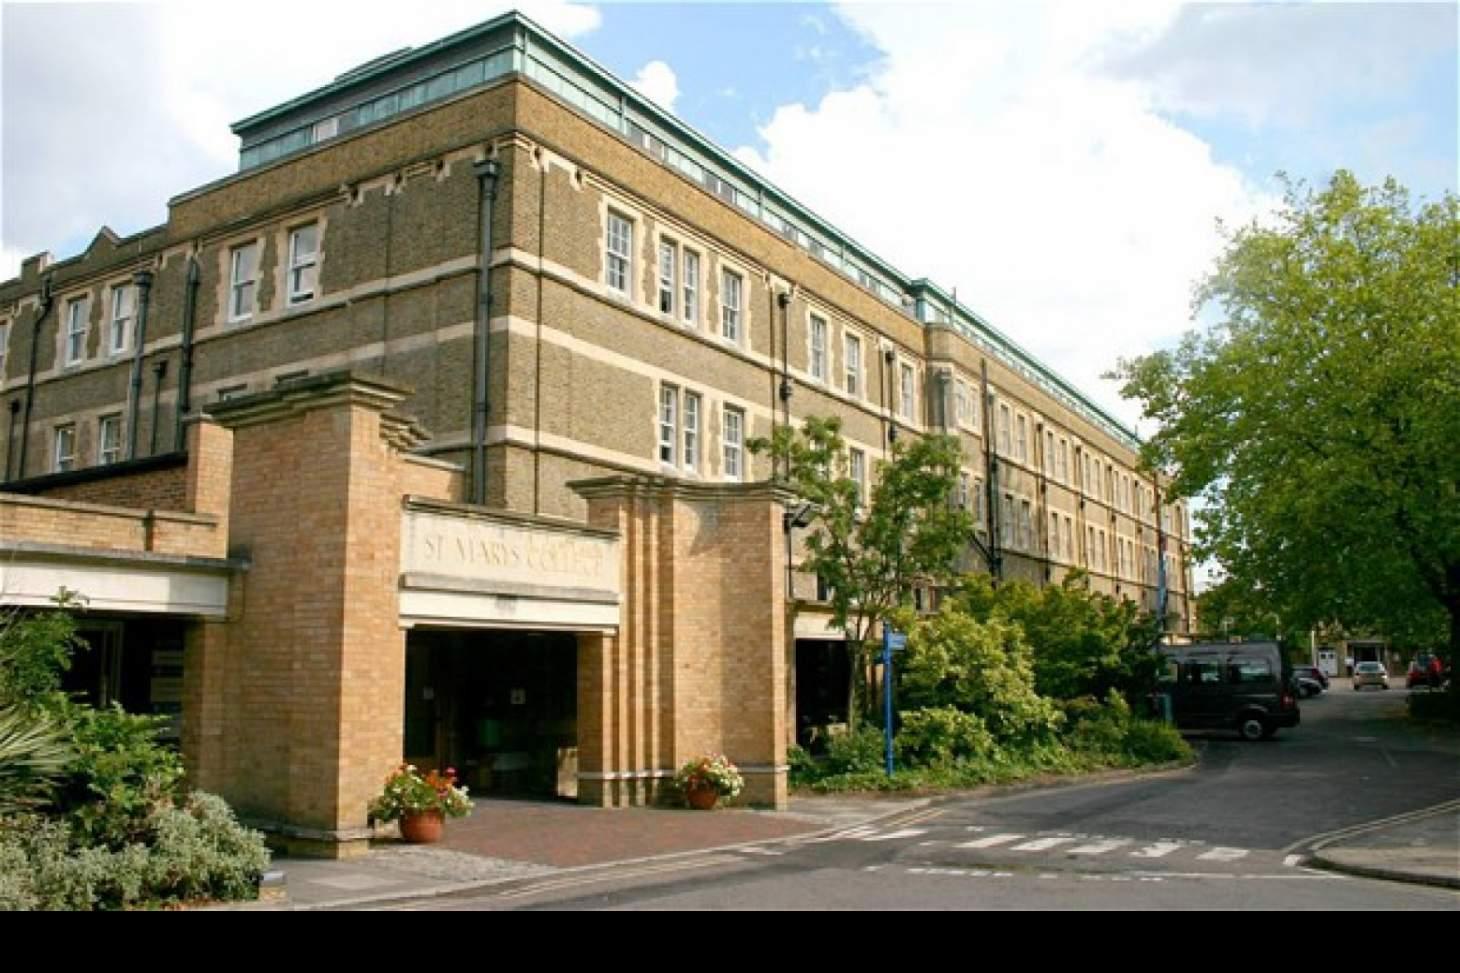 St Mary's University (Teddington Lock) 11 a side | Astroturf football pitch